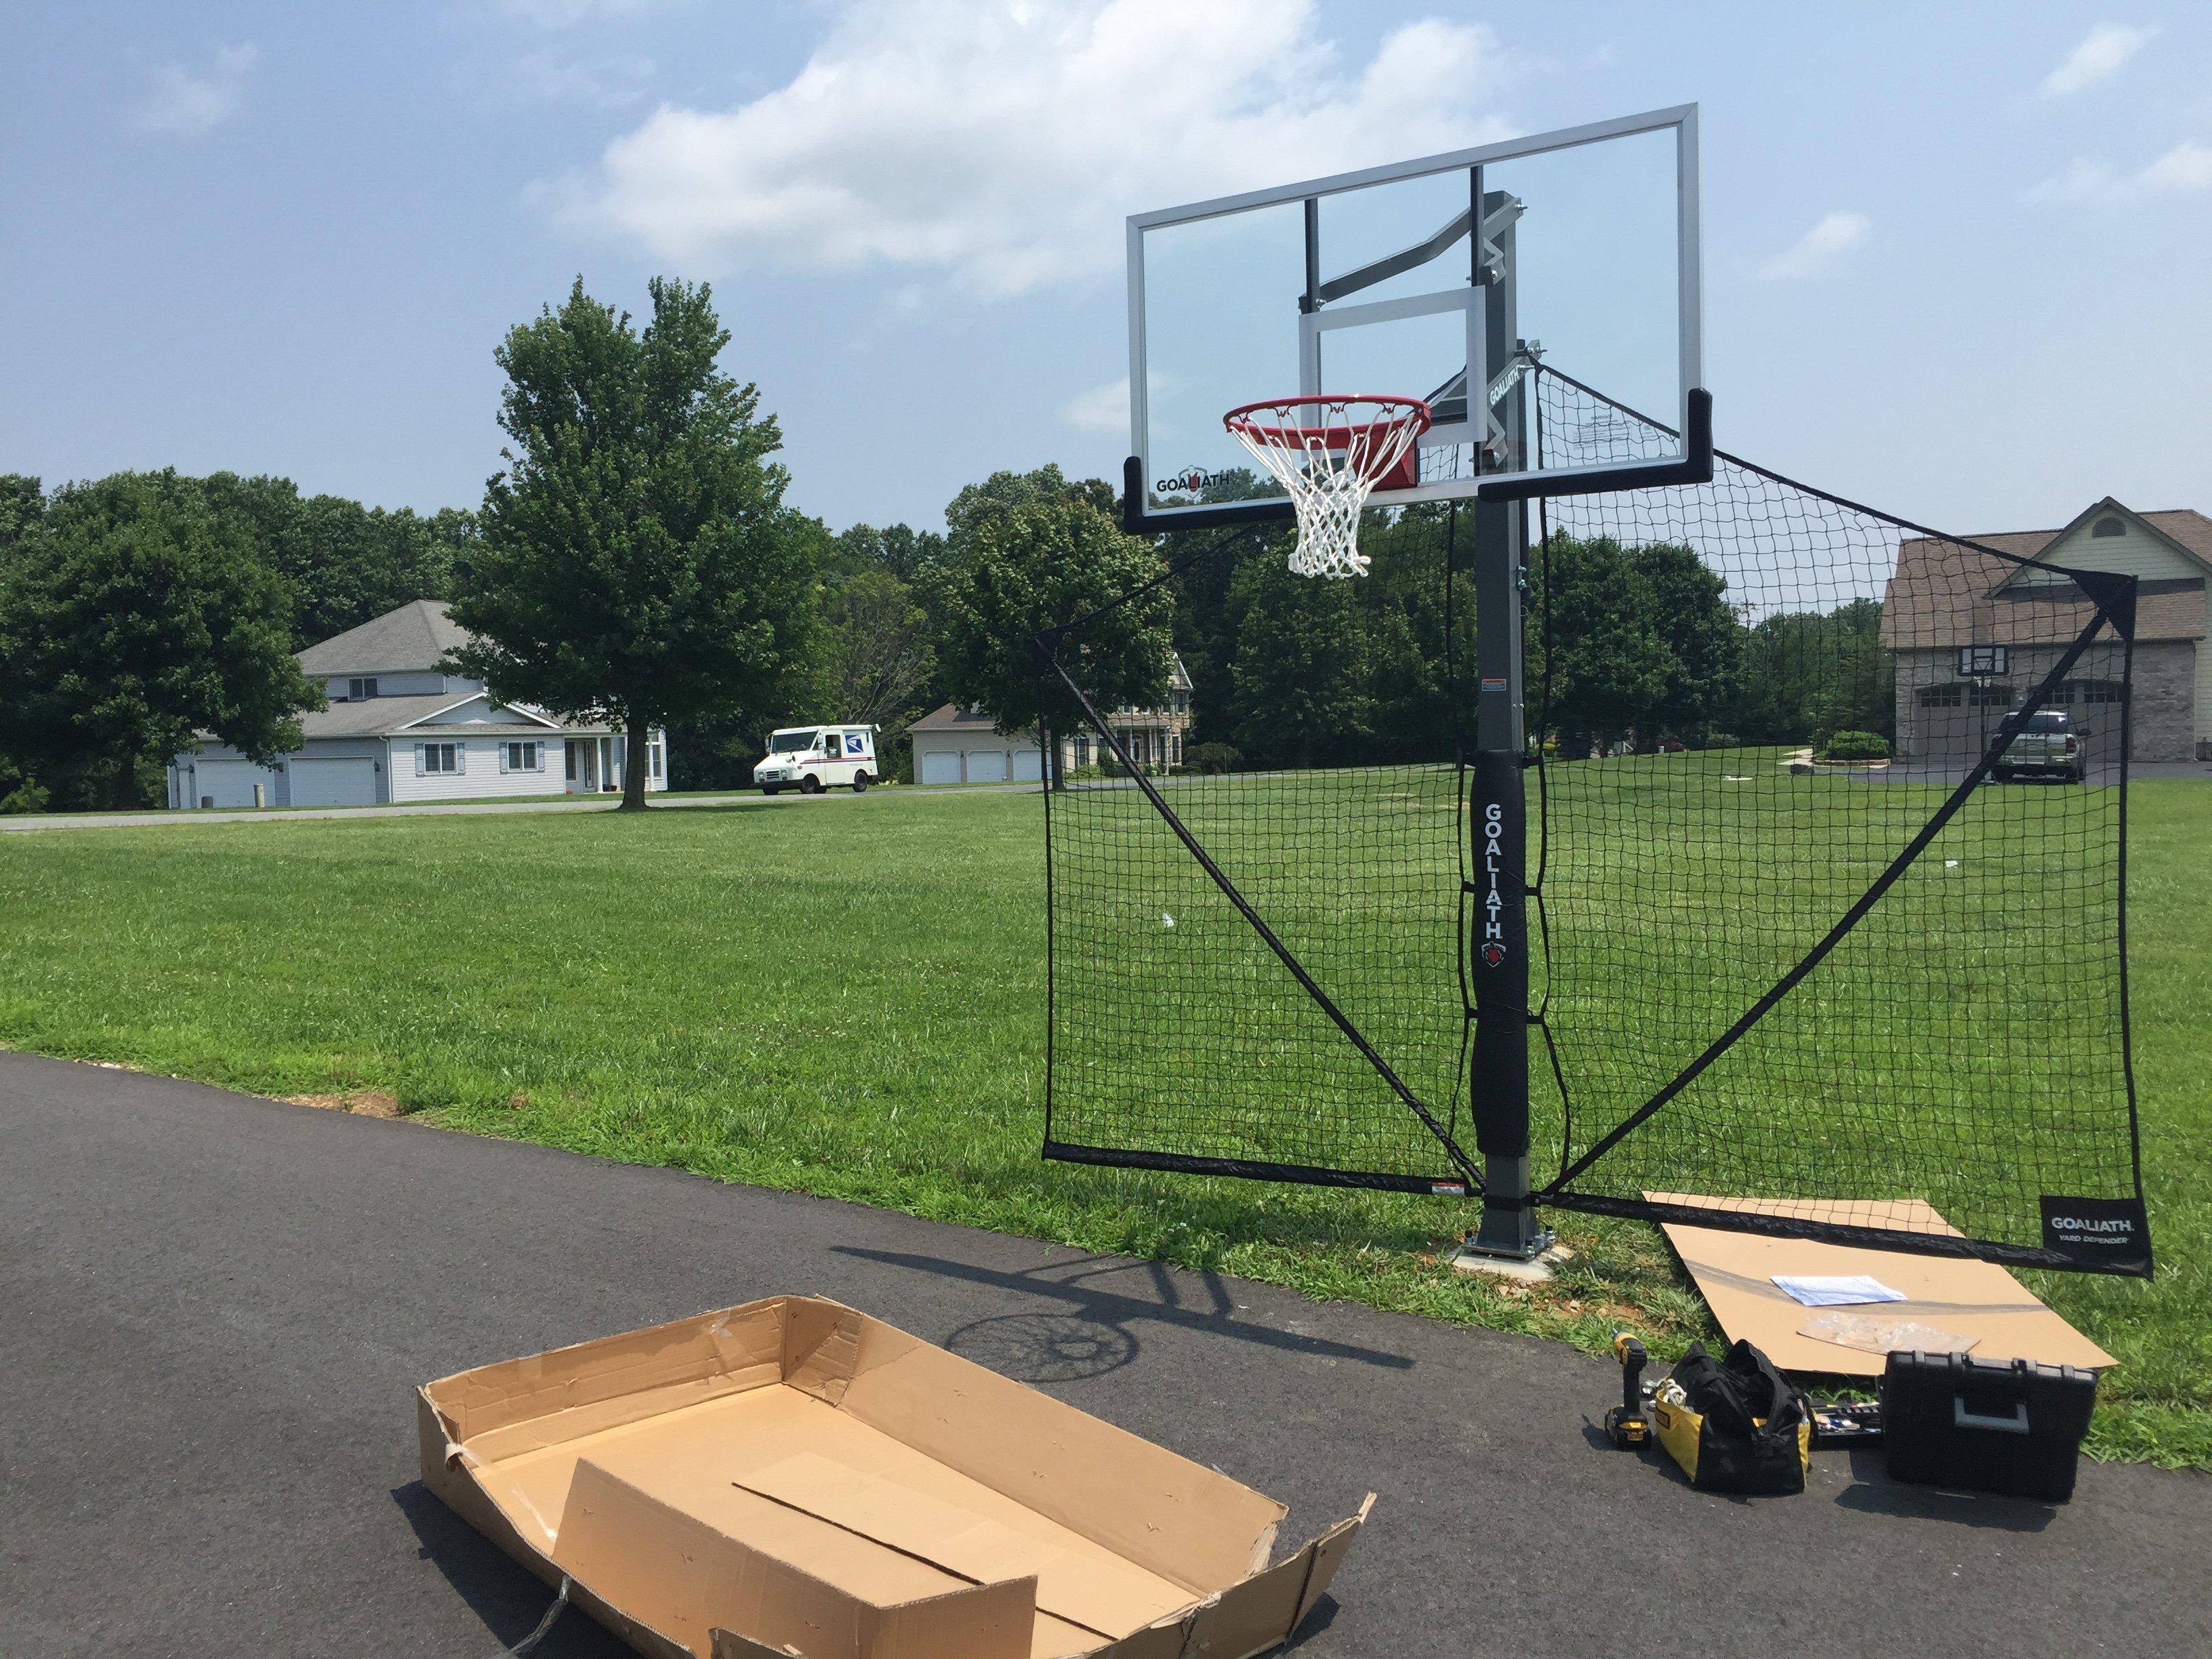 72 In Ground Basketball Installation Professionals